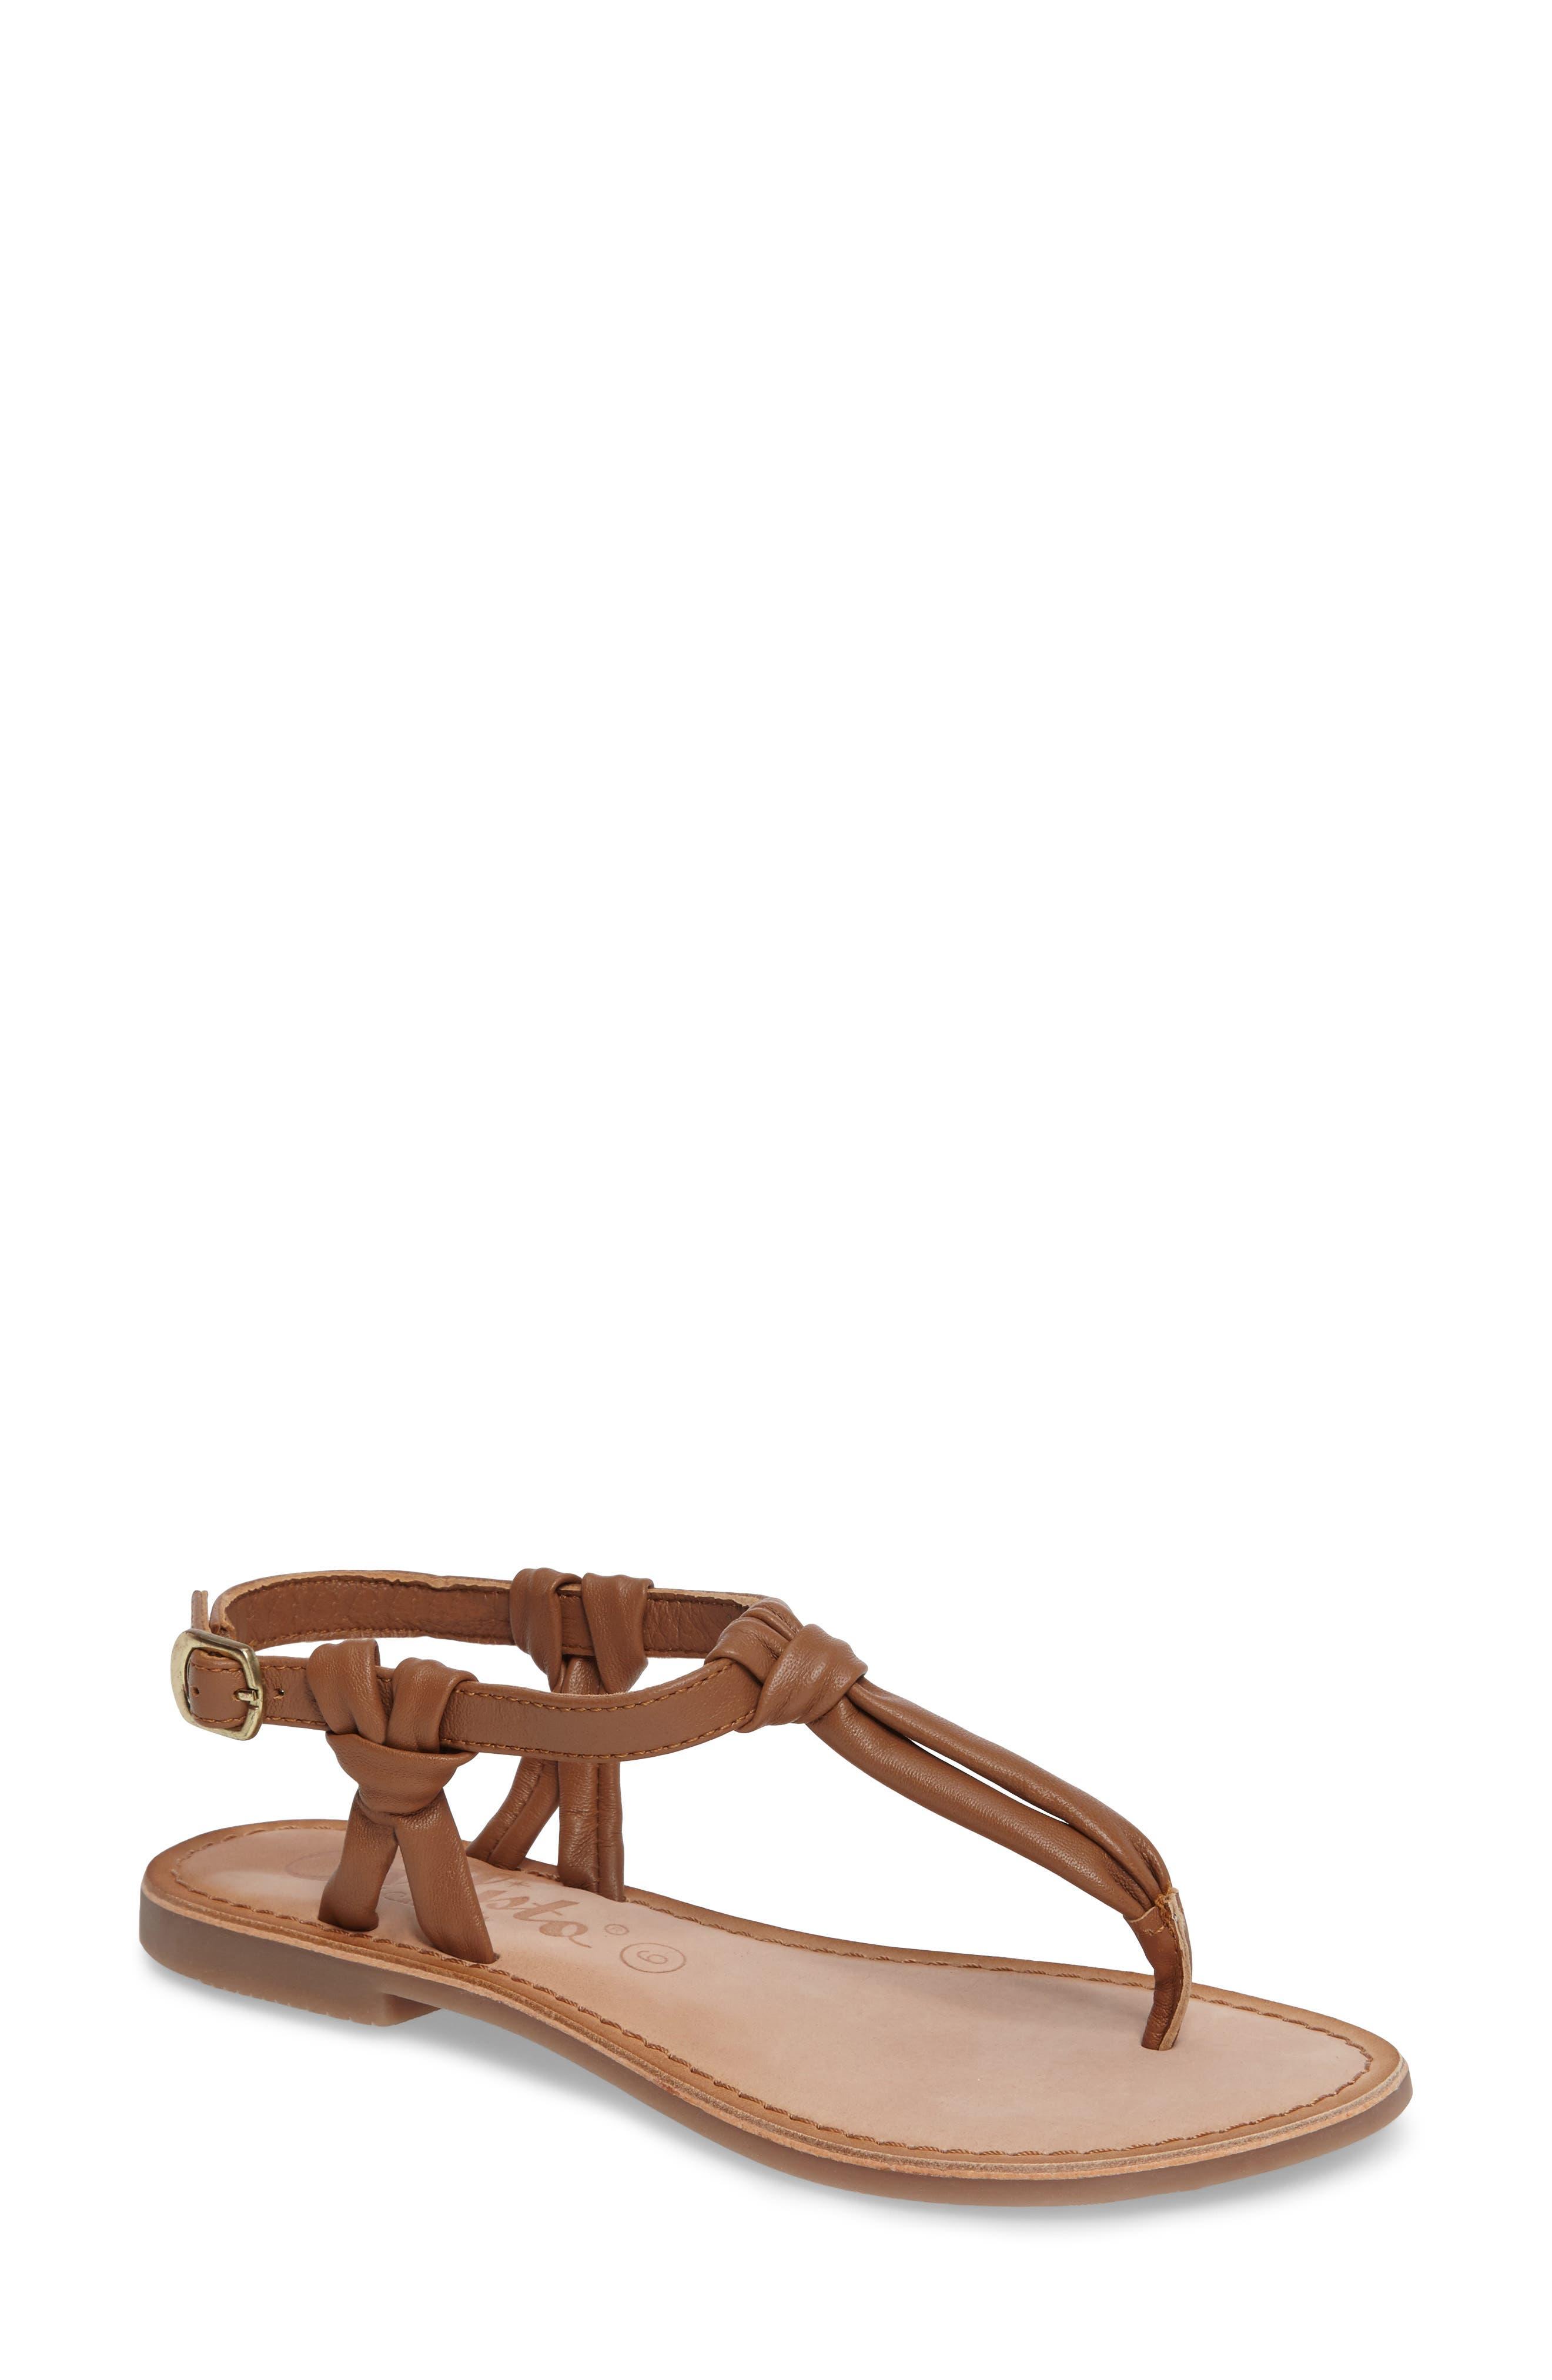 Azza T-Strap Sandal,                         Main,                         color, TAN LEATHER